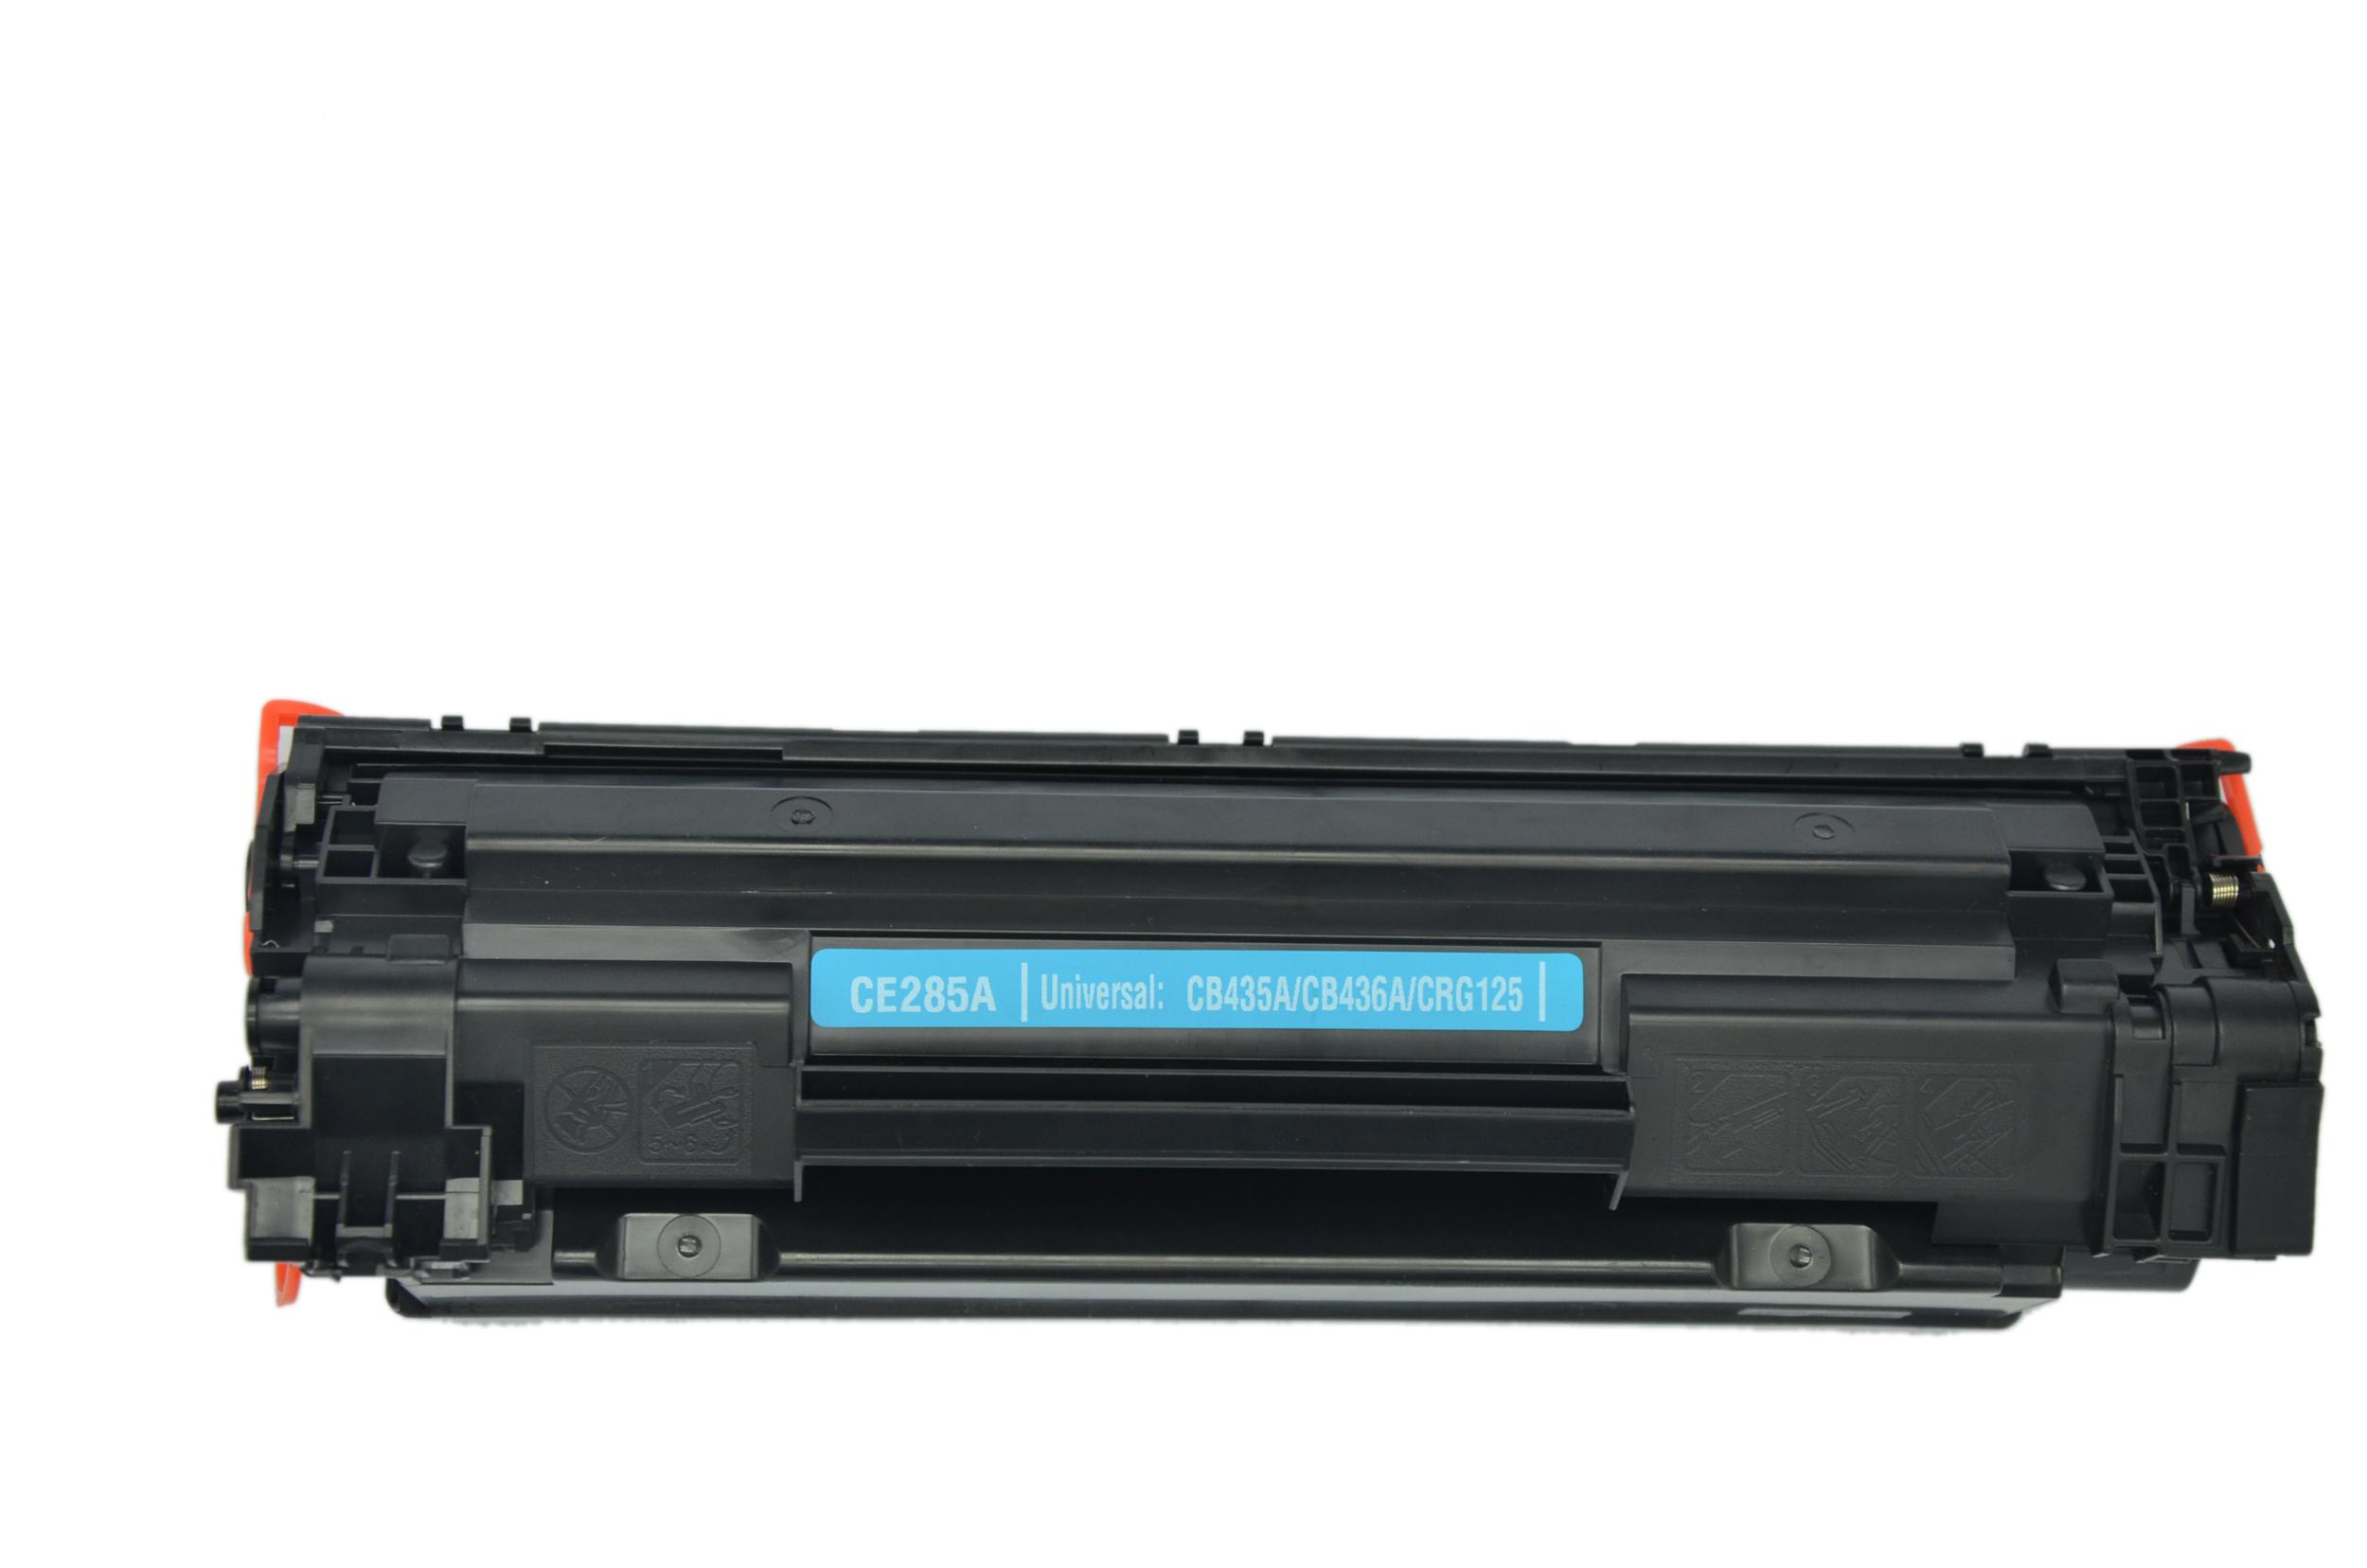 Compatible Black Toner Cartridge CE285A for P1102/1102W